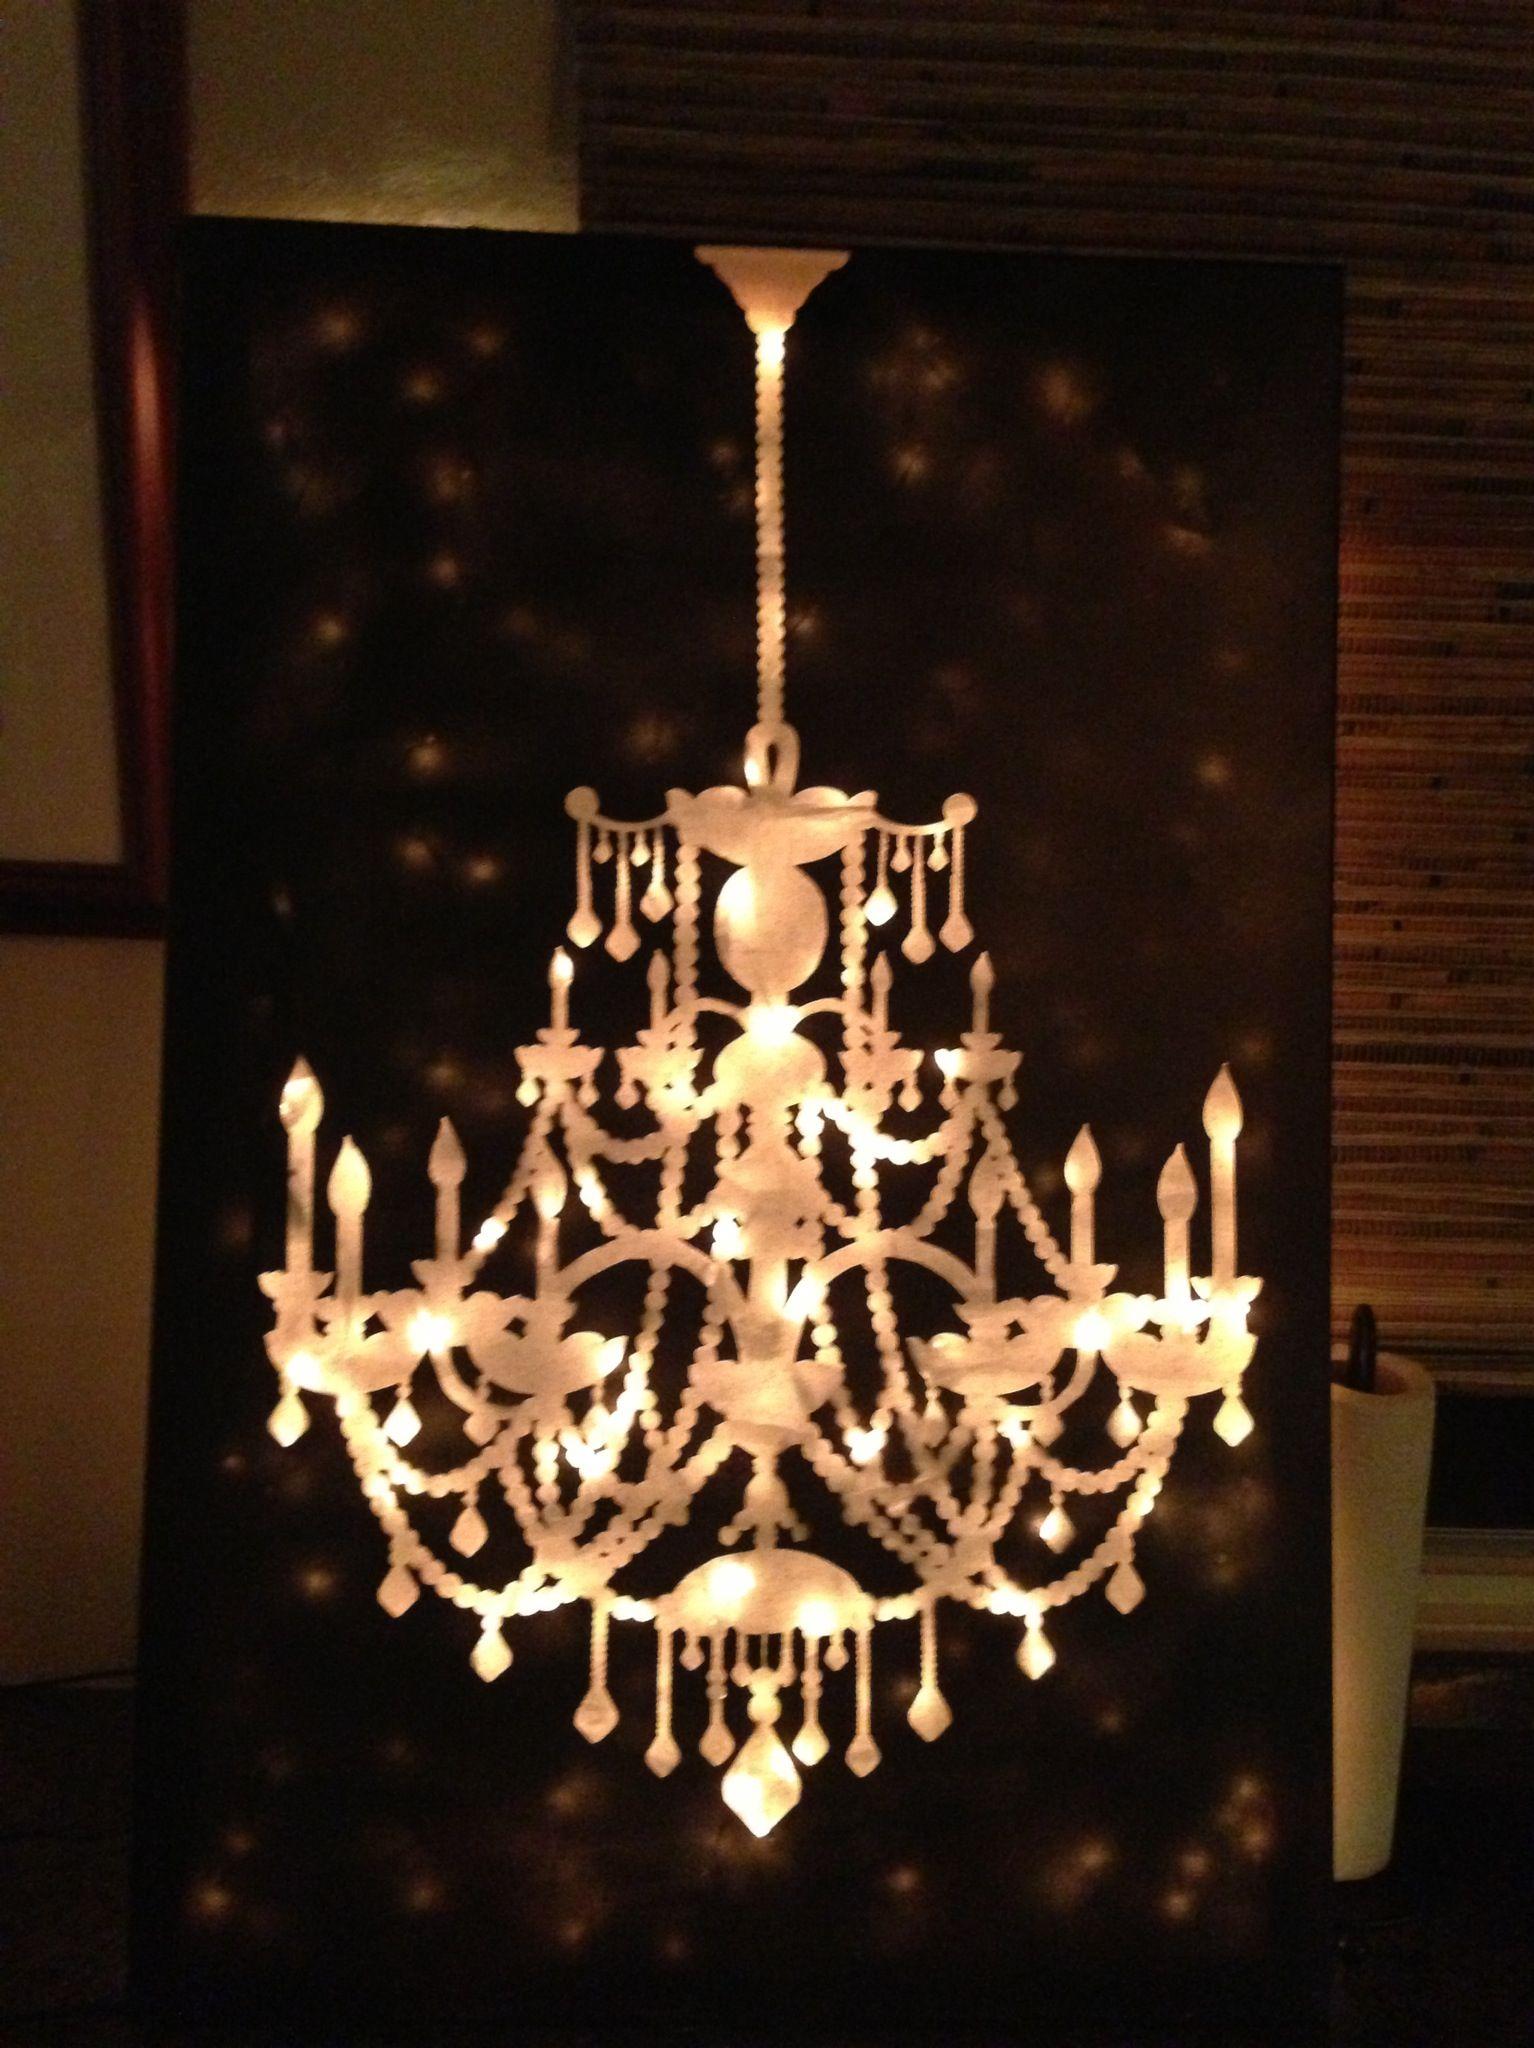 Chandelier canvas light art crafty